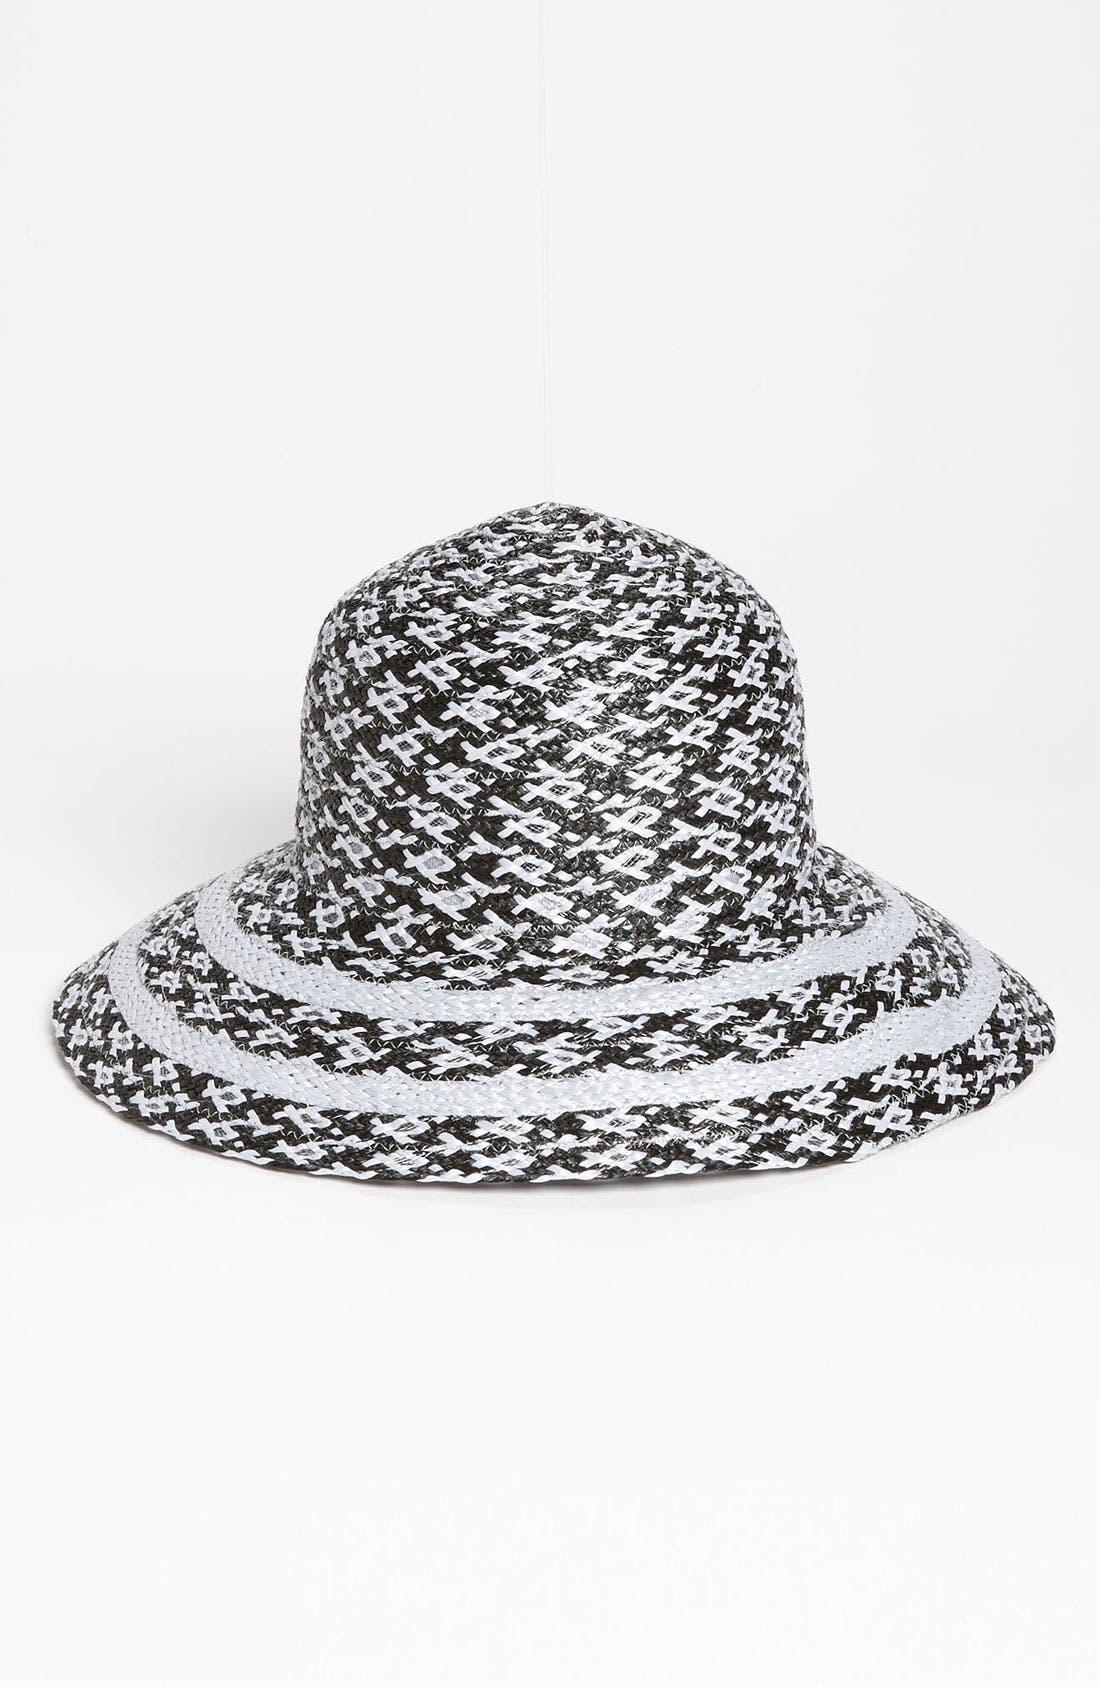 Alternate Image 1 Selected - Nordstrom 'Diamond' Raffia Hat